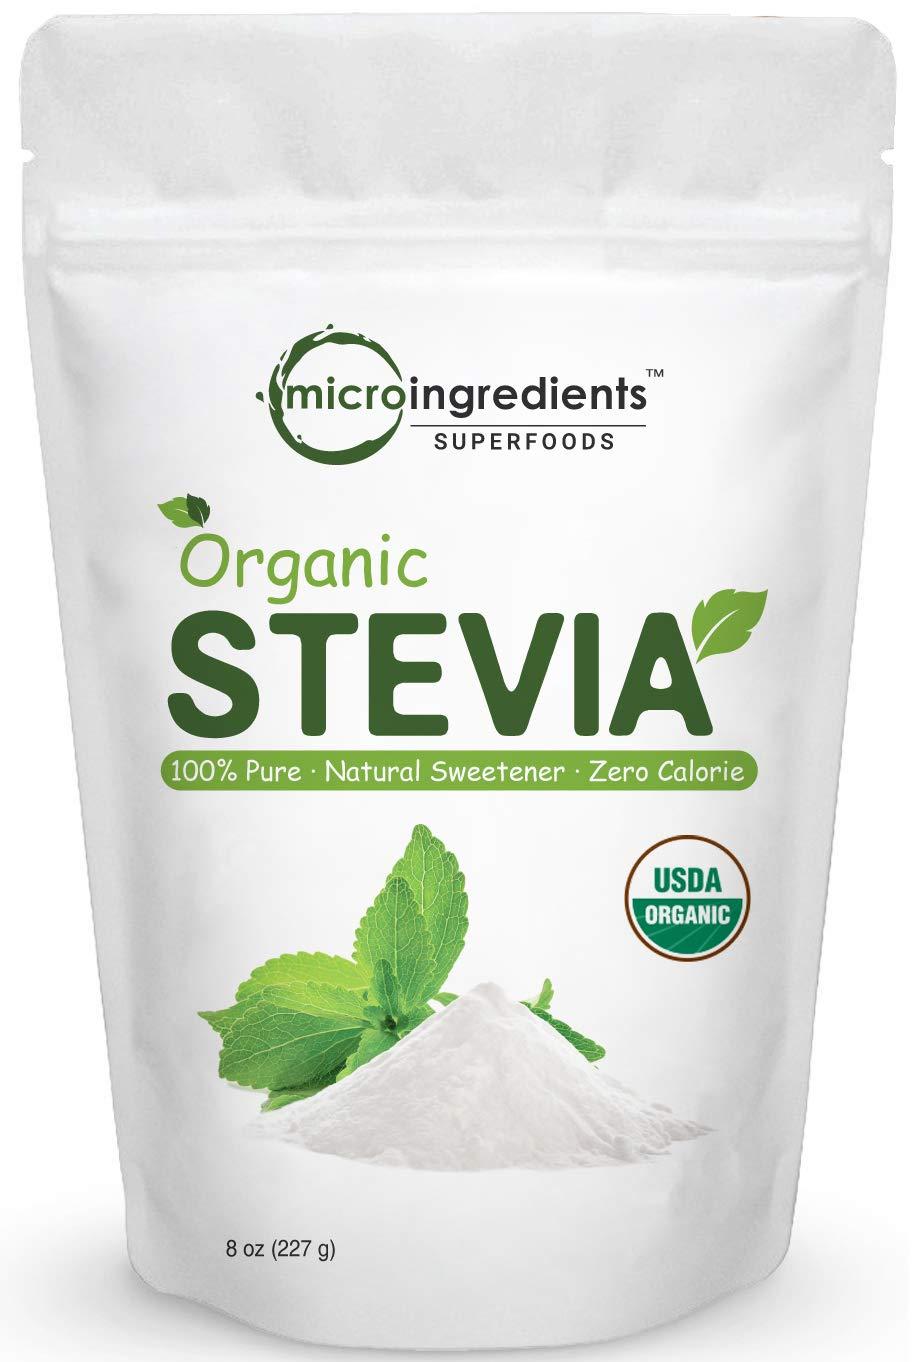 Pure Organic Stevia Powder, 8 Ounce, 1418 Serving, 0 Calorie, Natural Sweetener and Sugar Alternative, No GMOs and Vegan Friendly